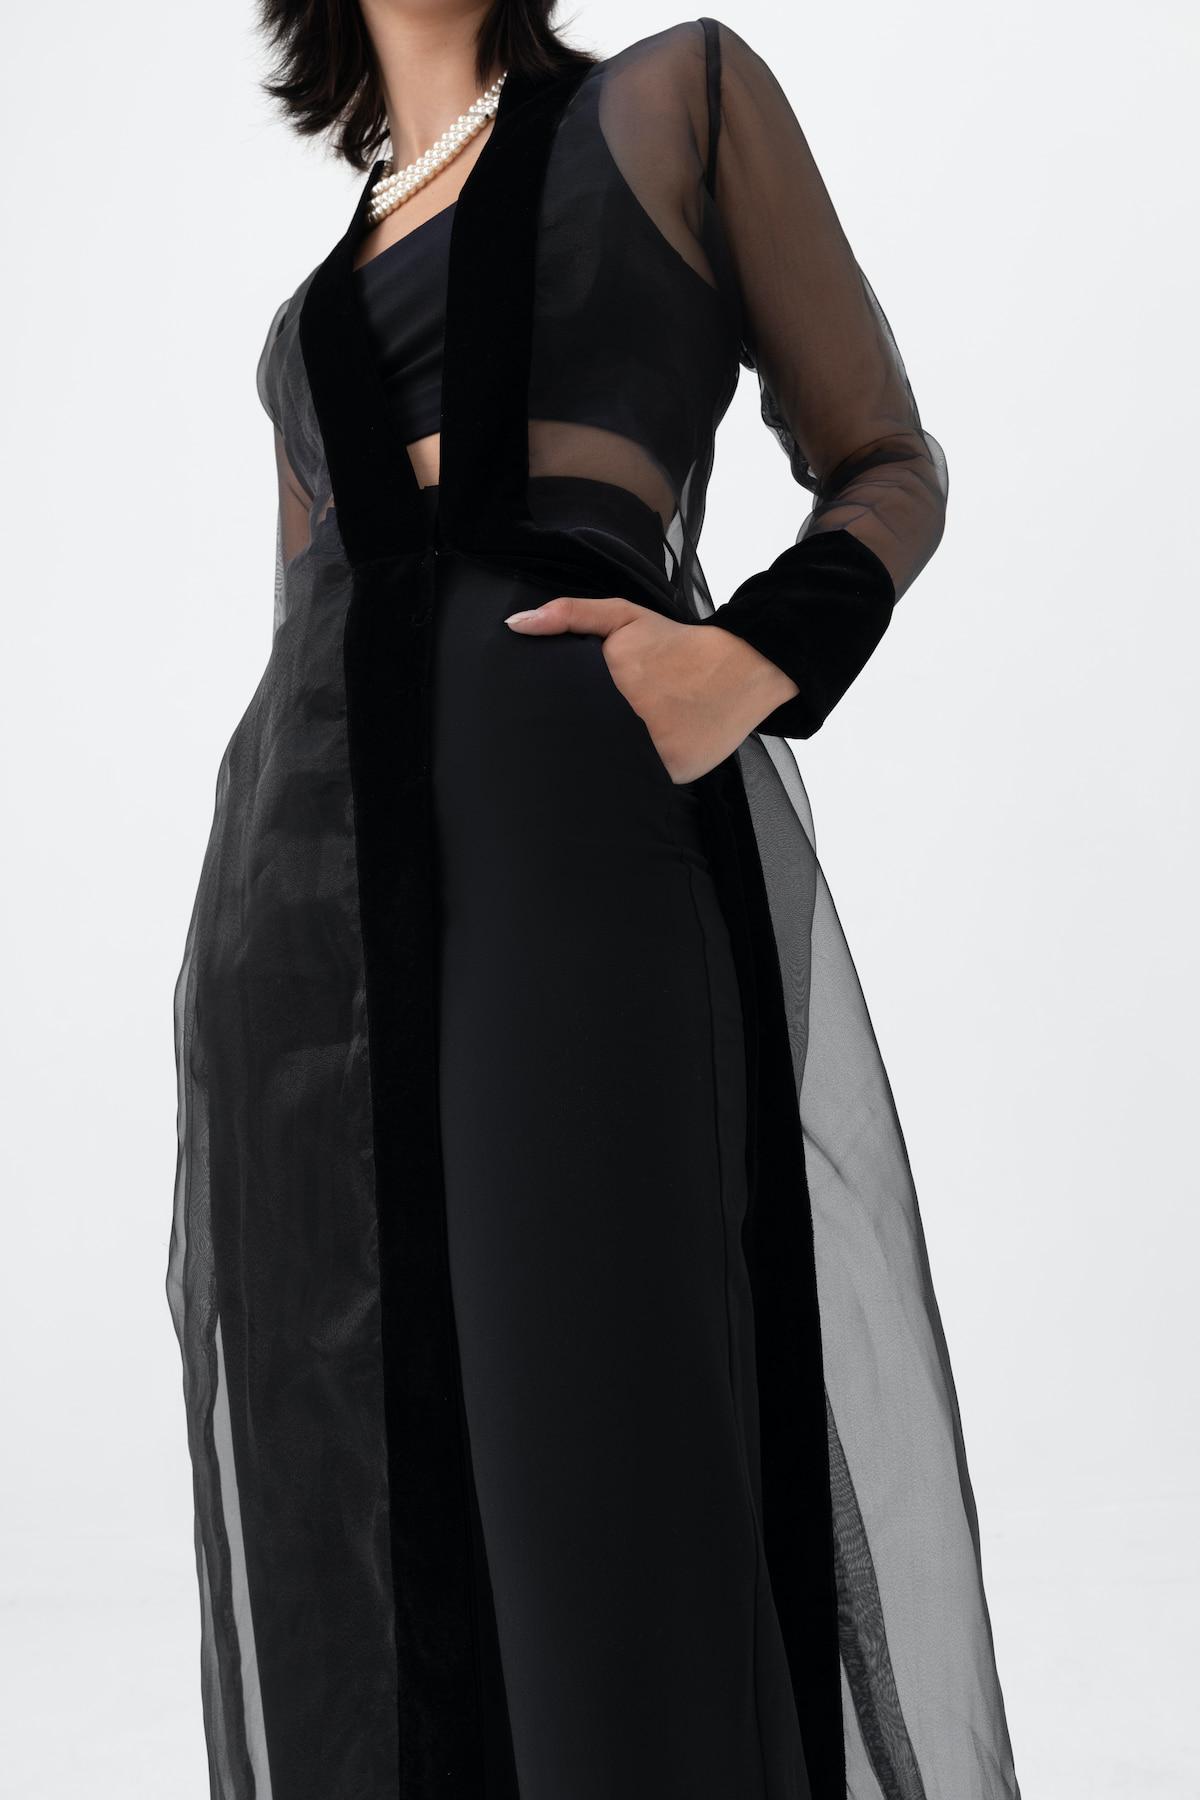 View 3 of model wearing Kiera Kimono in black.